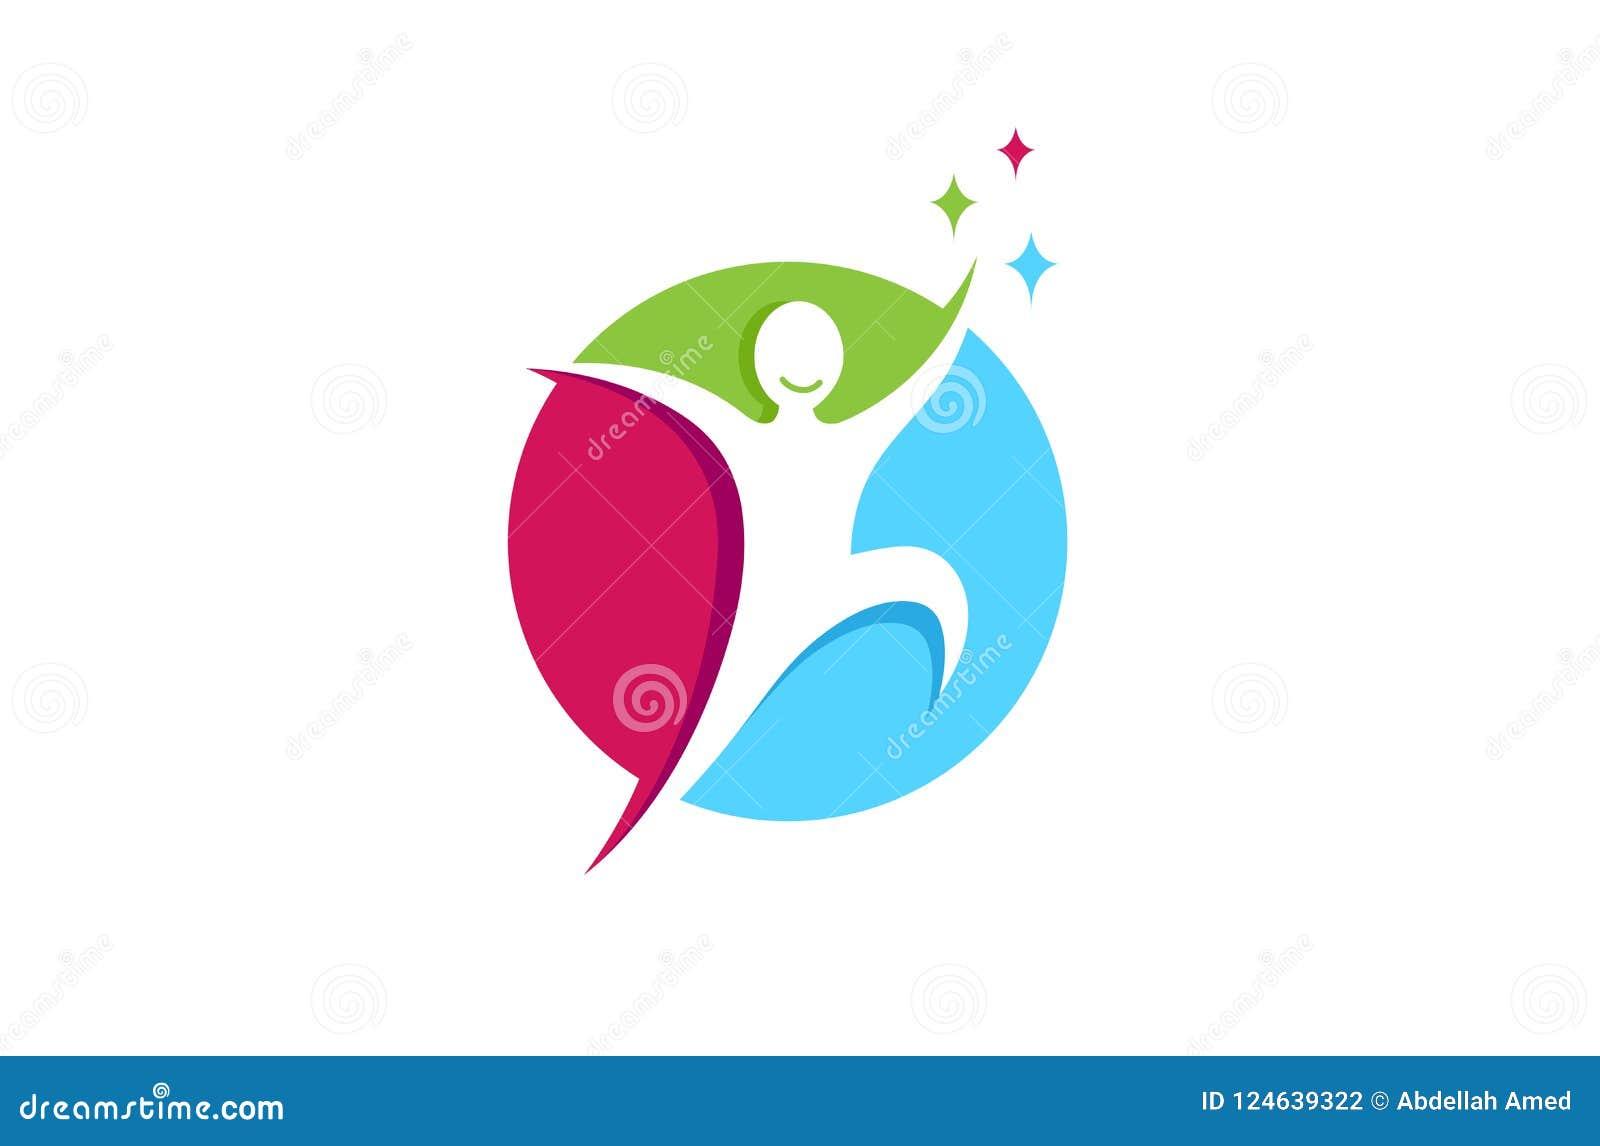 Logotipo feliz de salto criativo de Person Freedom Metaphor Gift Hope